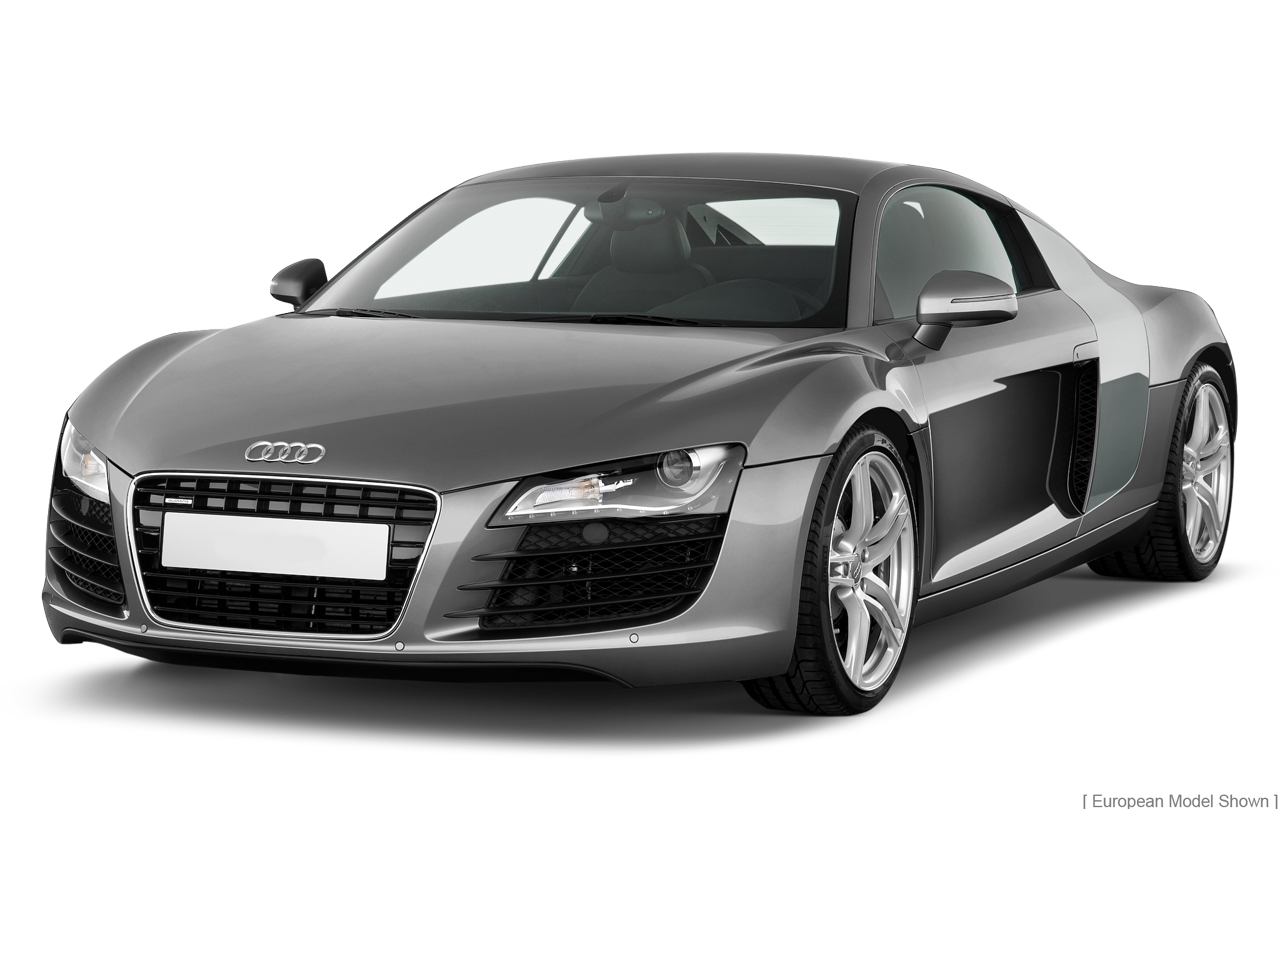 Audi Car Png New Car Update 2020